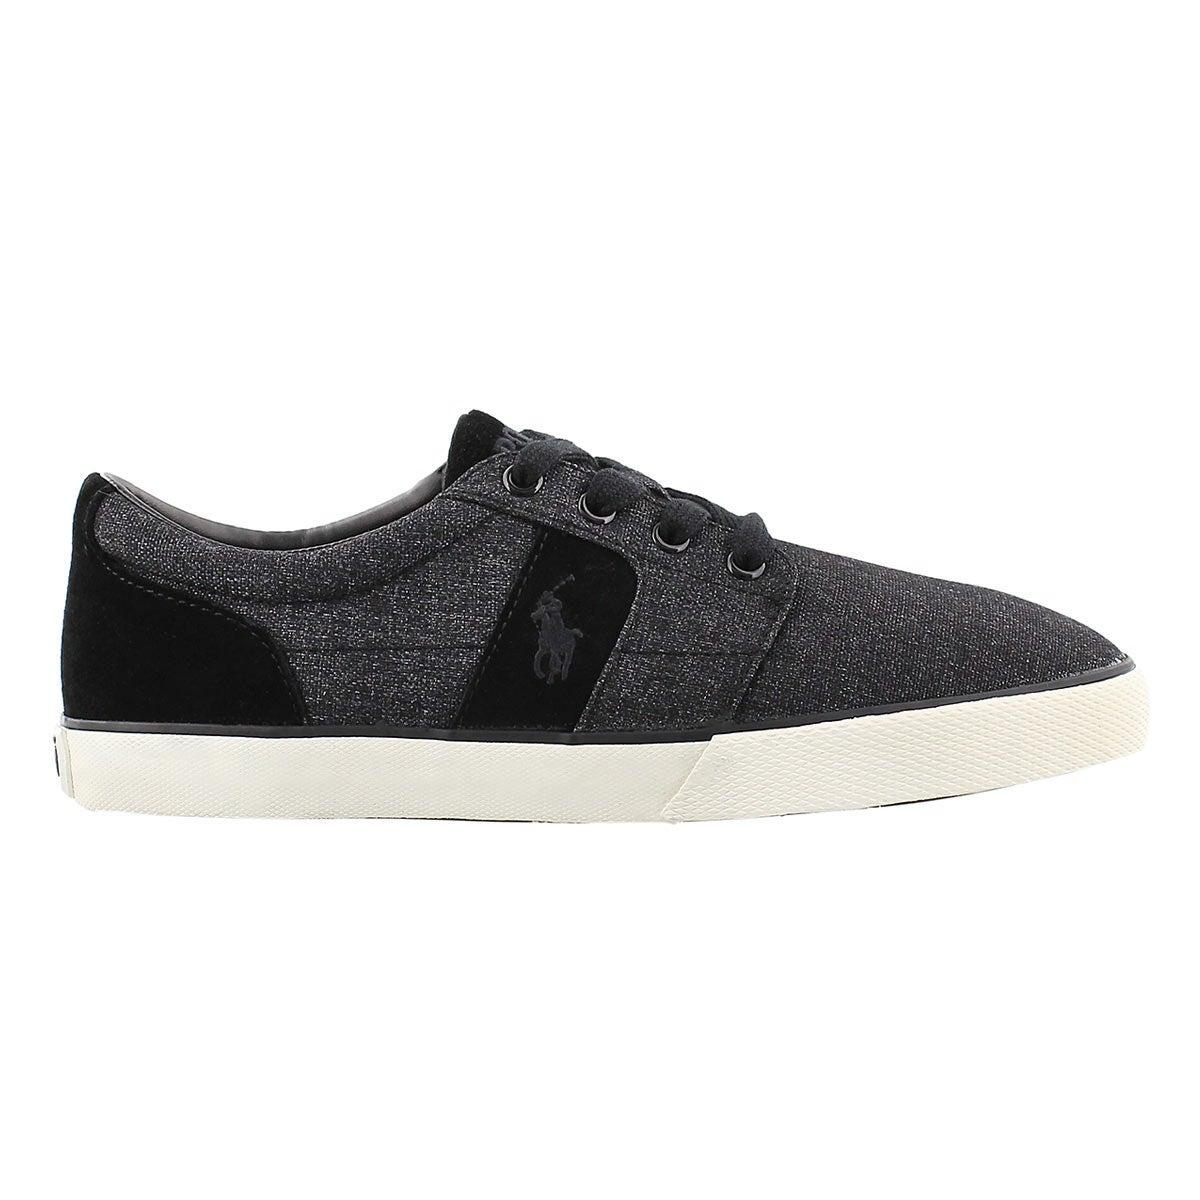 Mns Halmore black suede/nylon sneaker